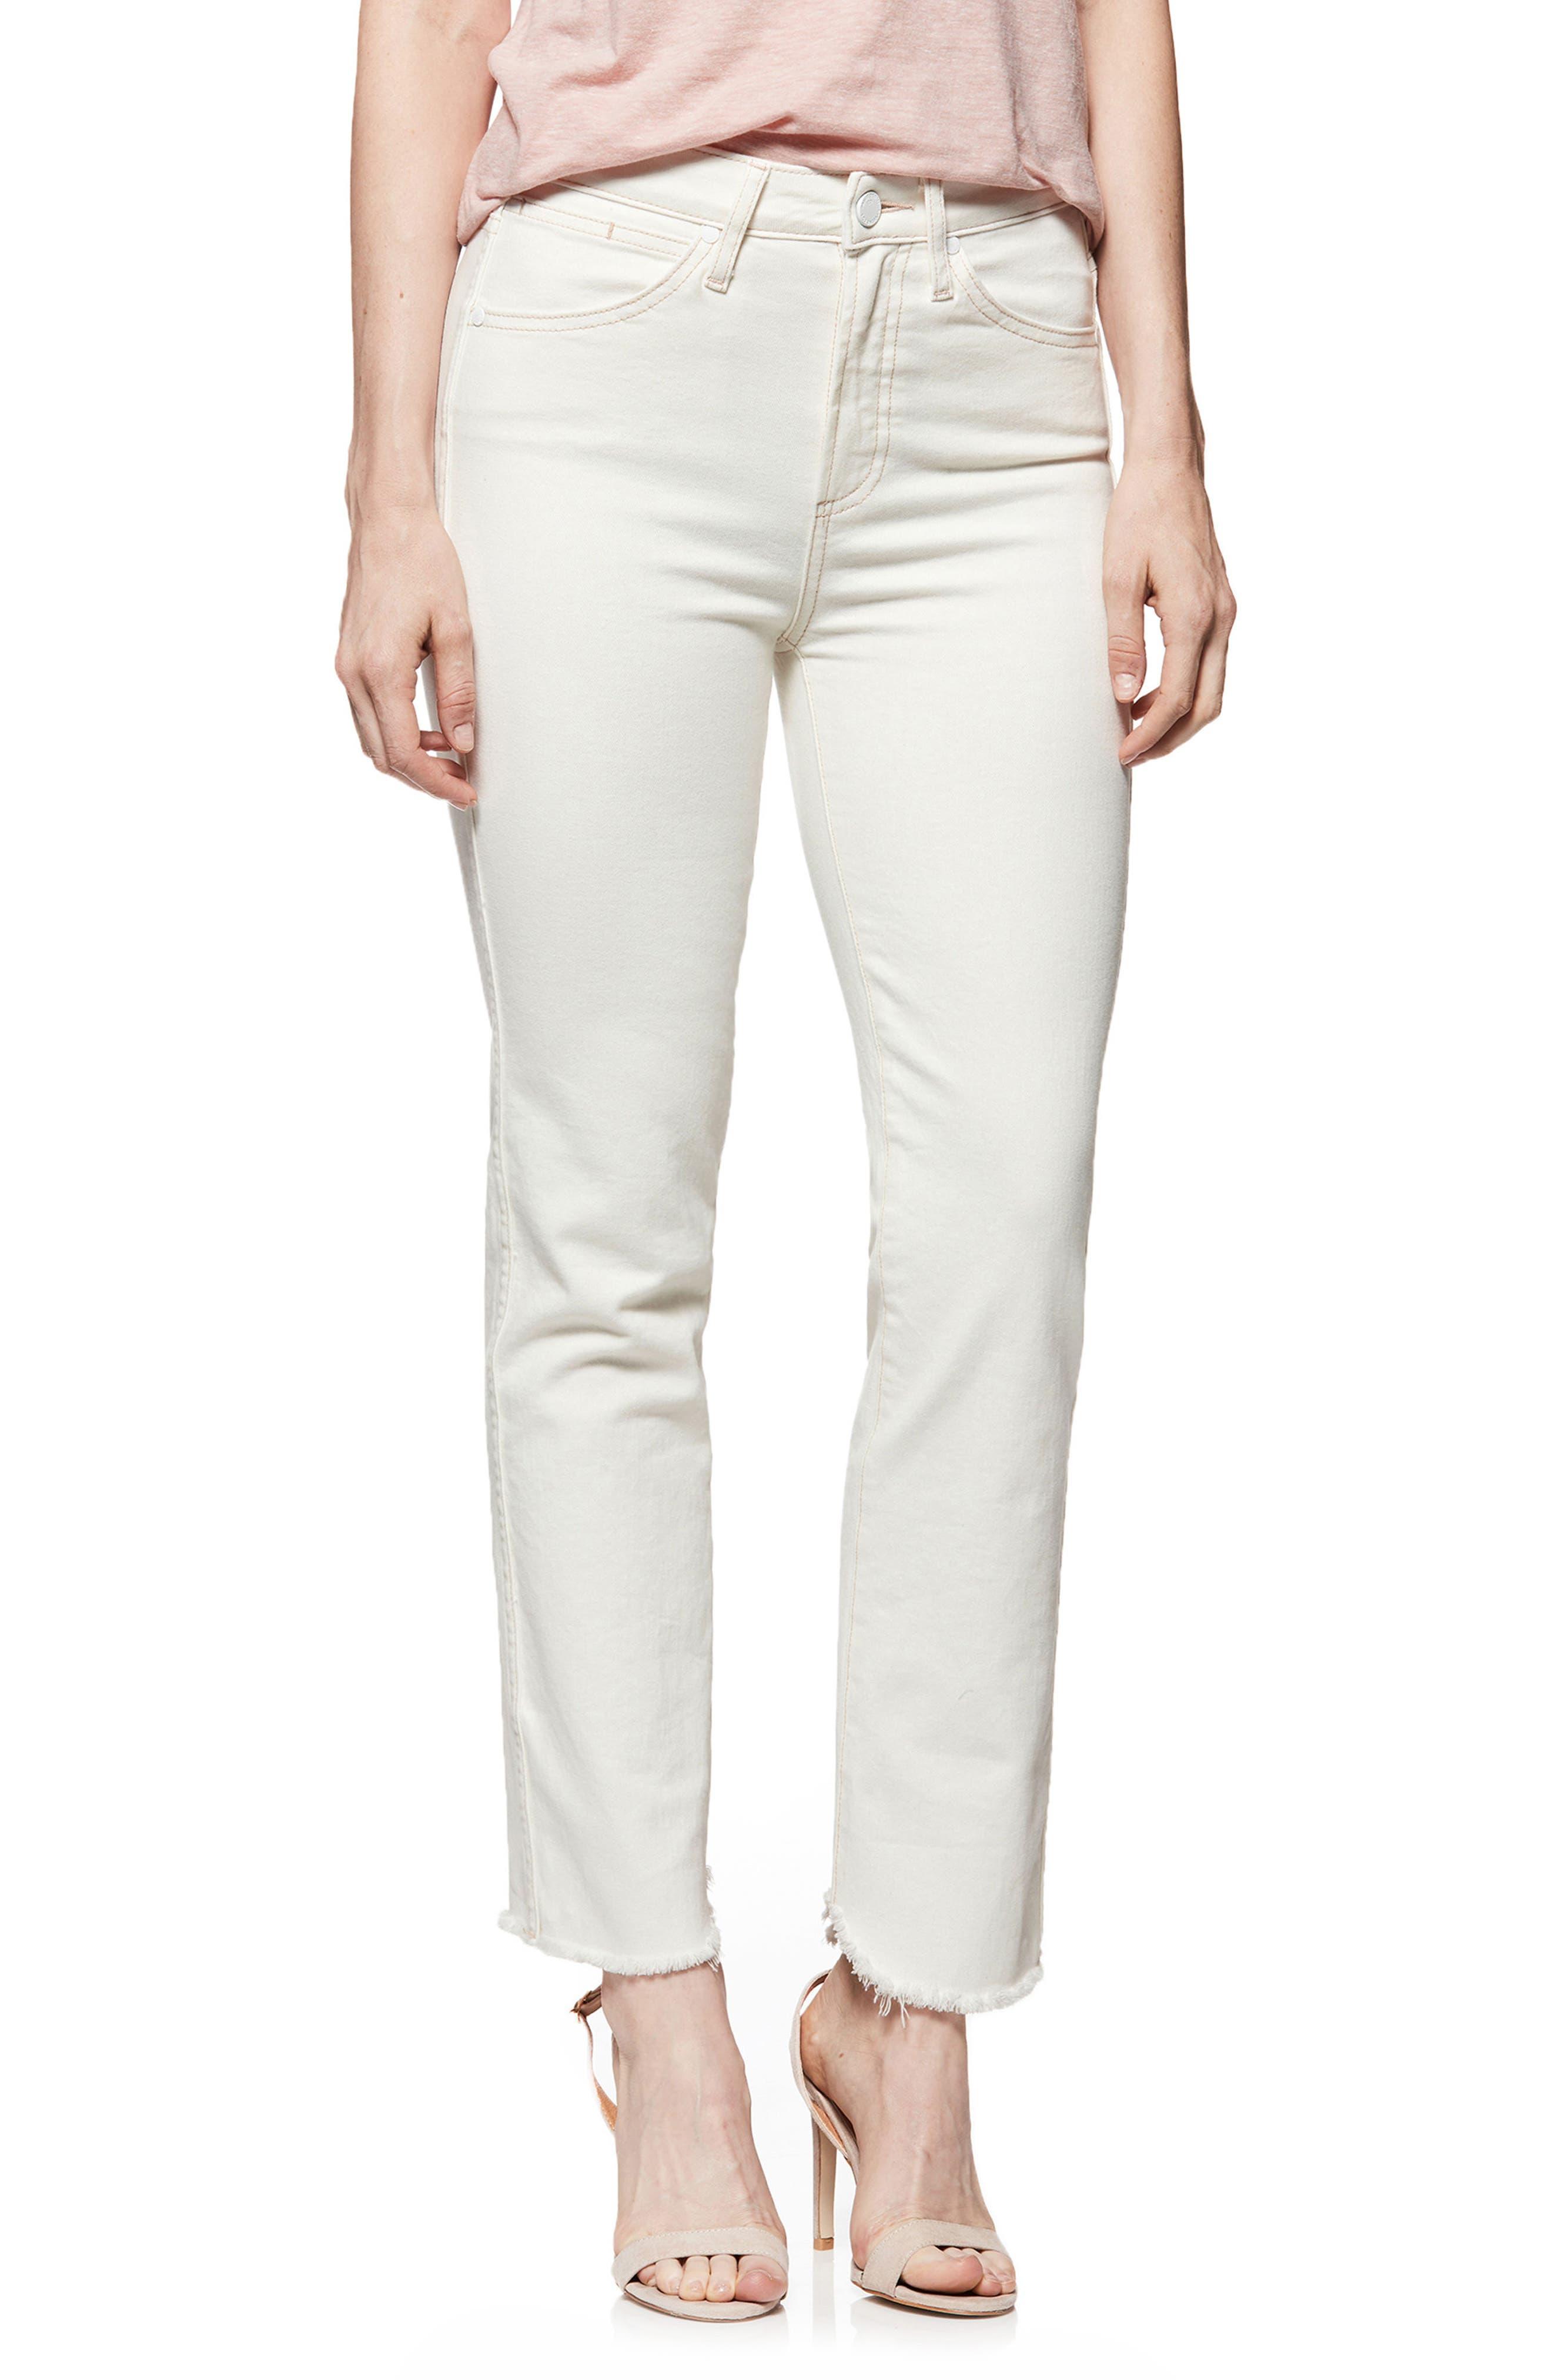 Hoxton High Waist Ankle Straight Jeans,                         Main,                         color, 901